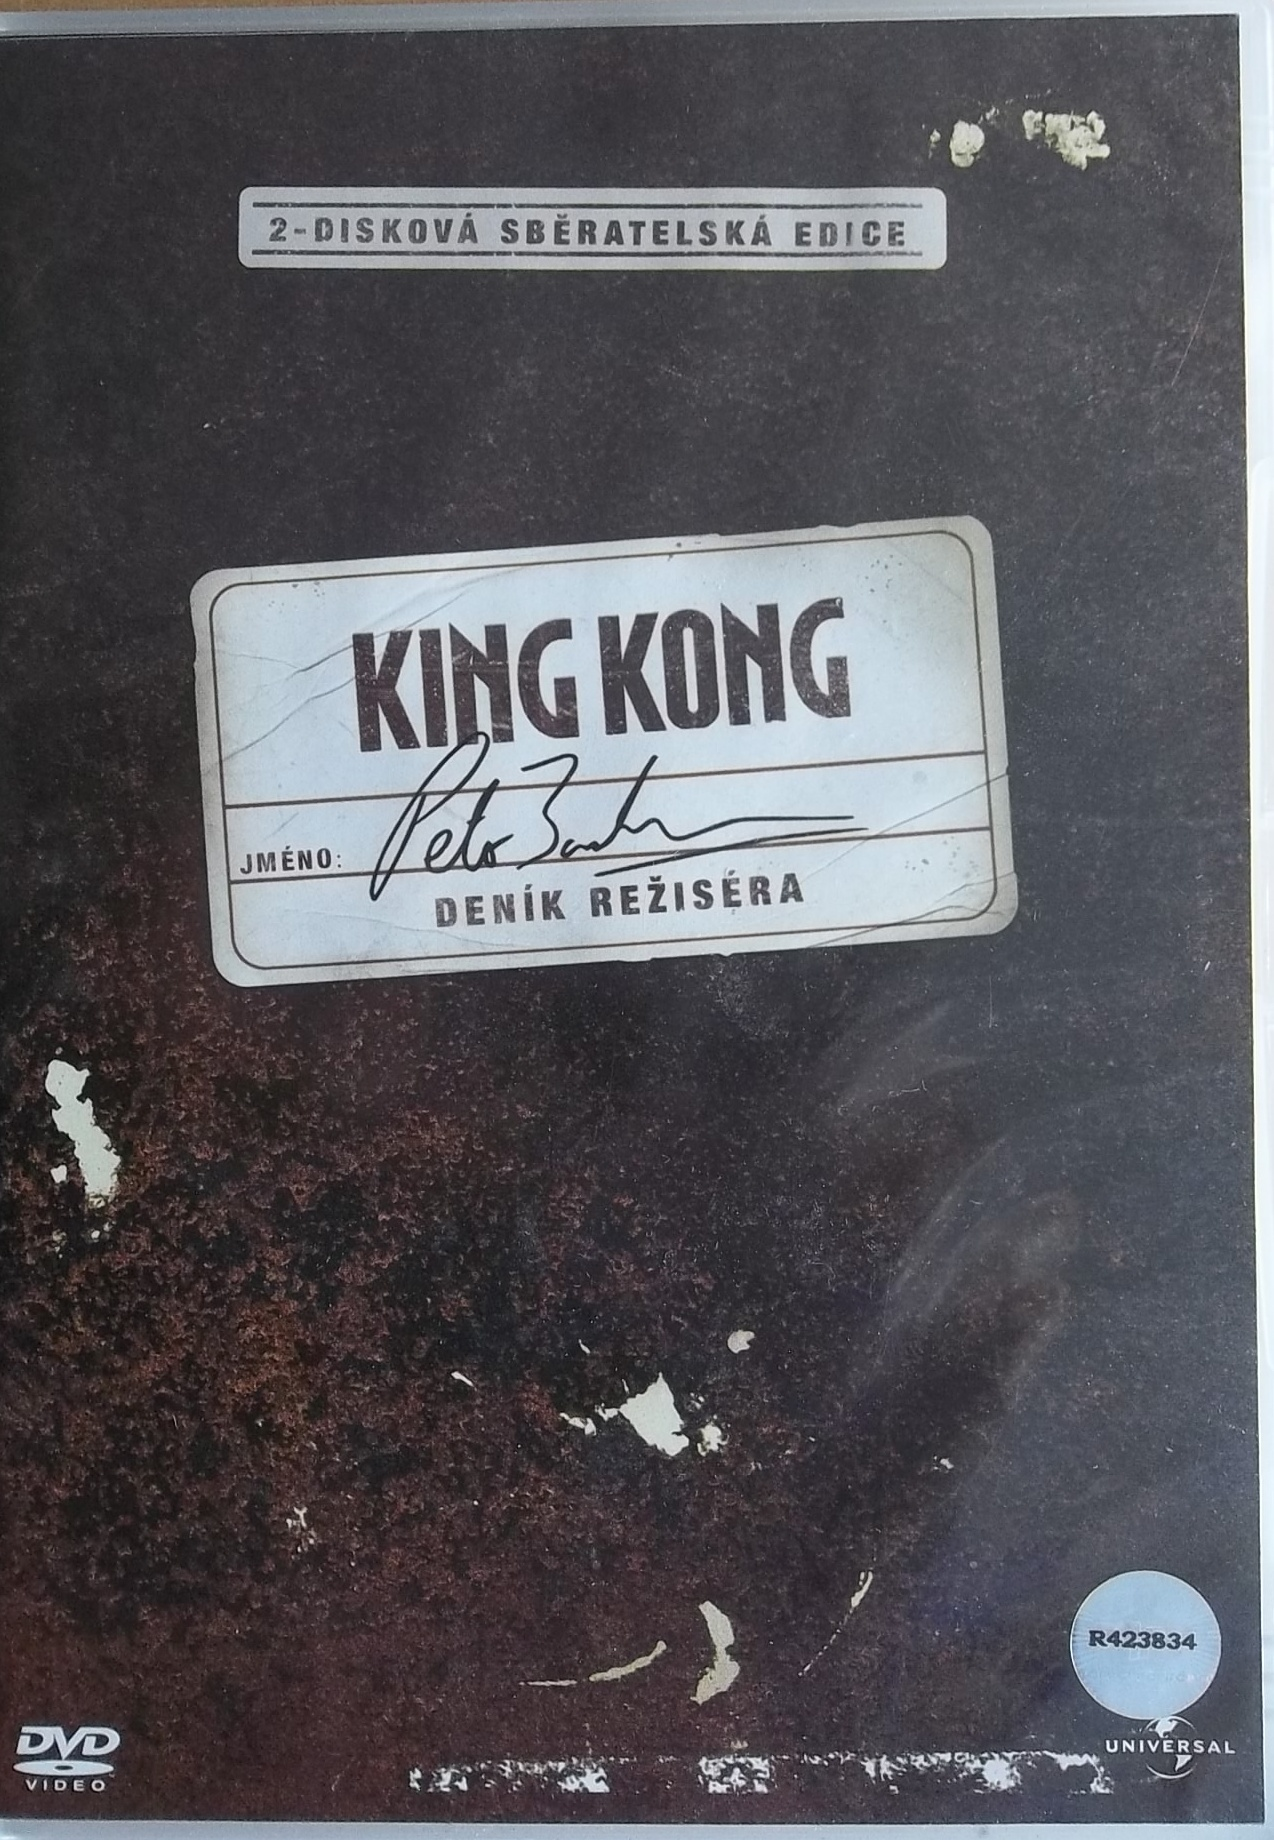 King Kong 2disková edice - DVD